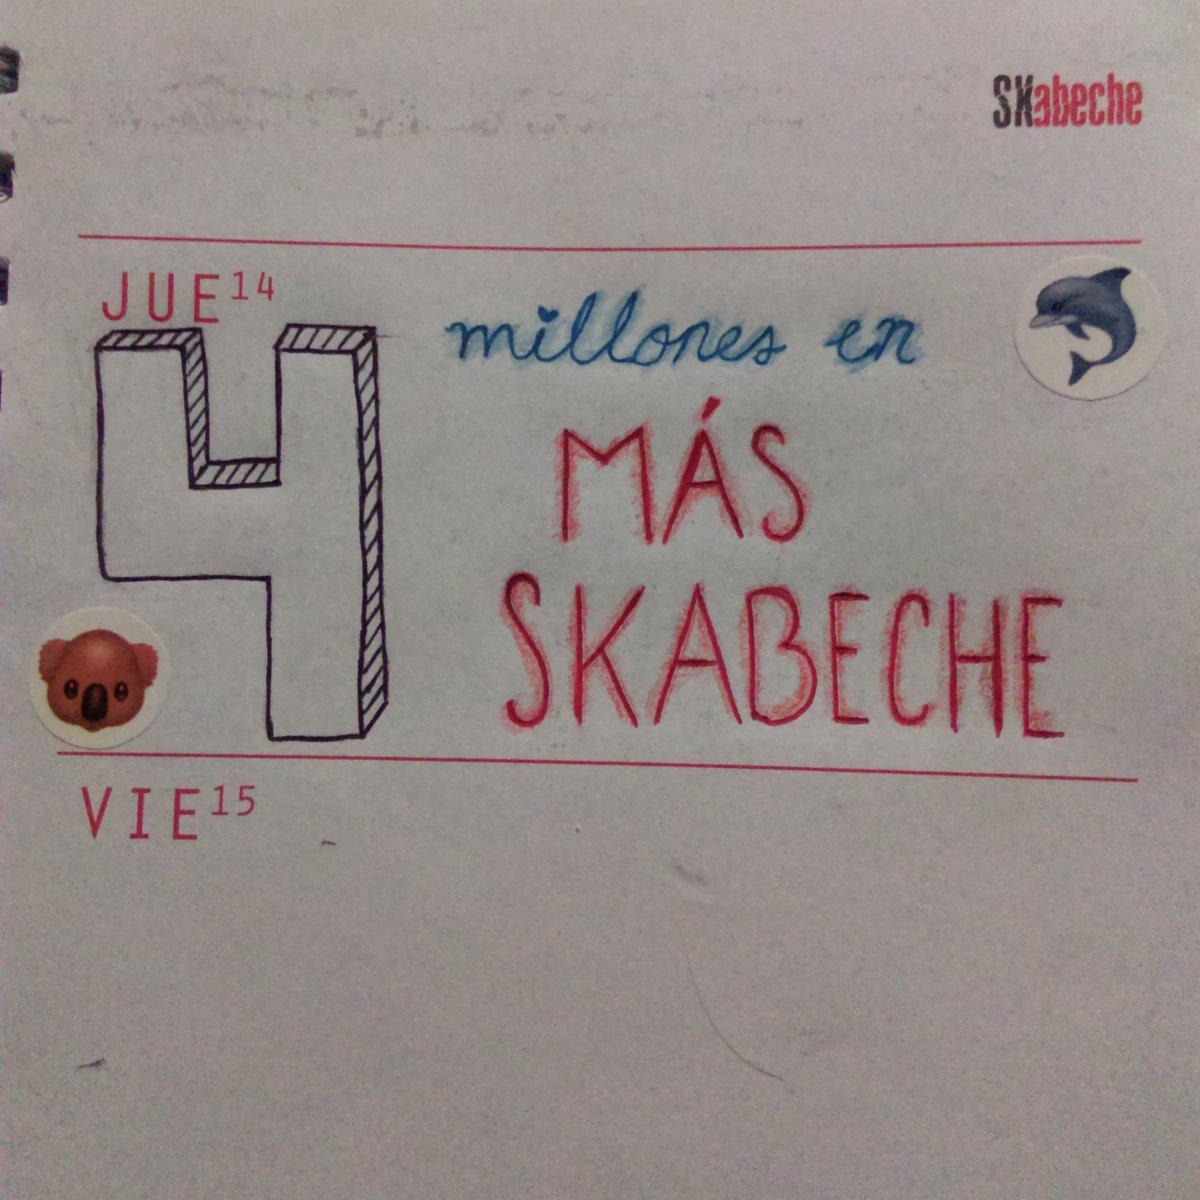 🔥♥MES SKABECHE♥🔥4MMSK💫18.MAR.19✨'s photo on #4MillonesEnMasSKabeche